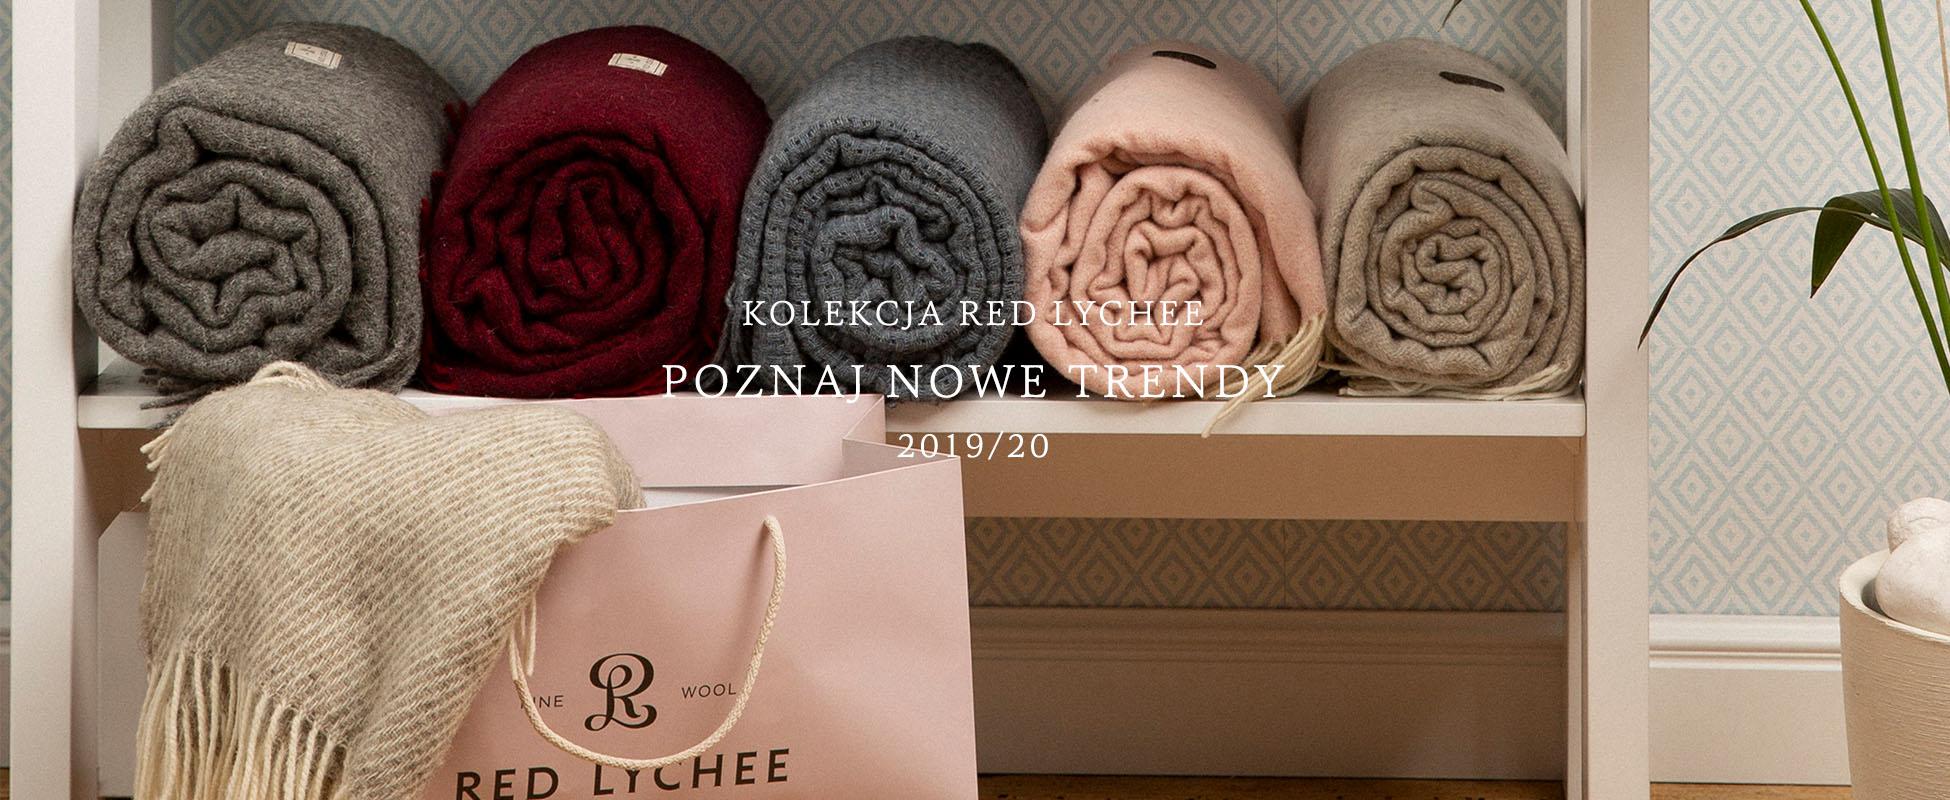 Koce, Pledy, Narzuty Red Lychee - www.red-lychee.pl